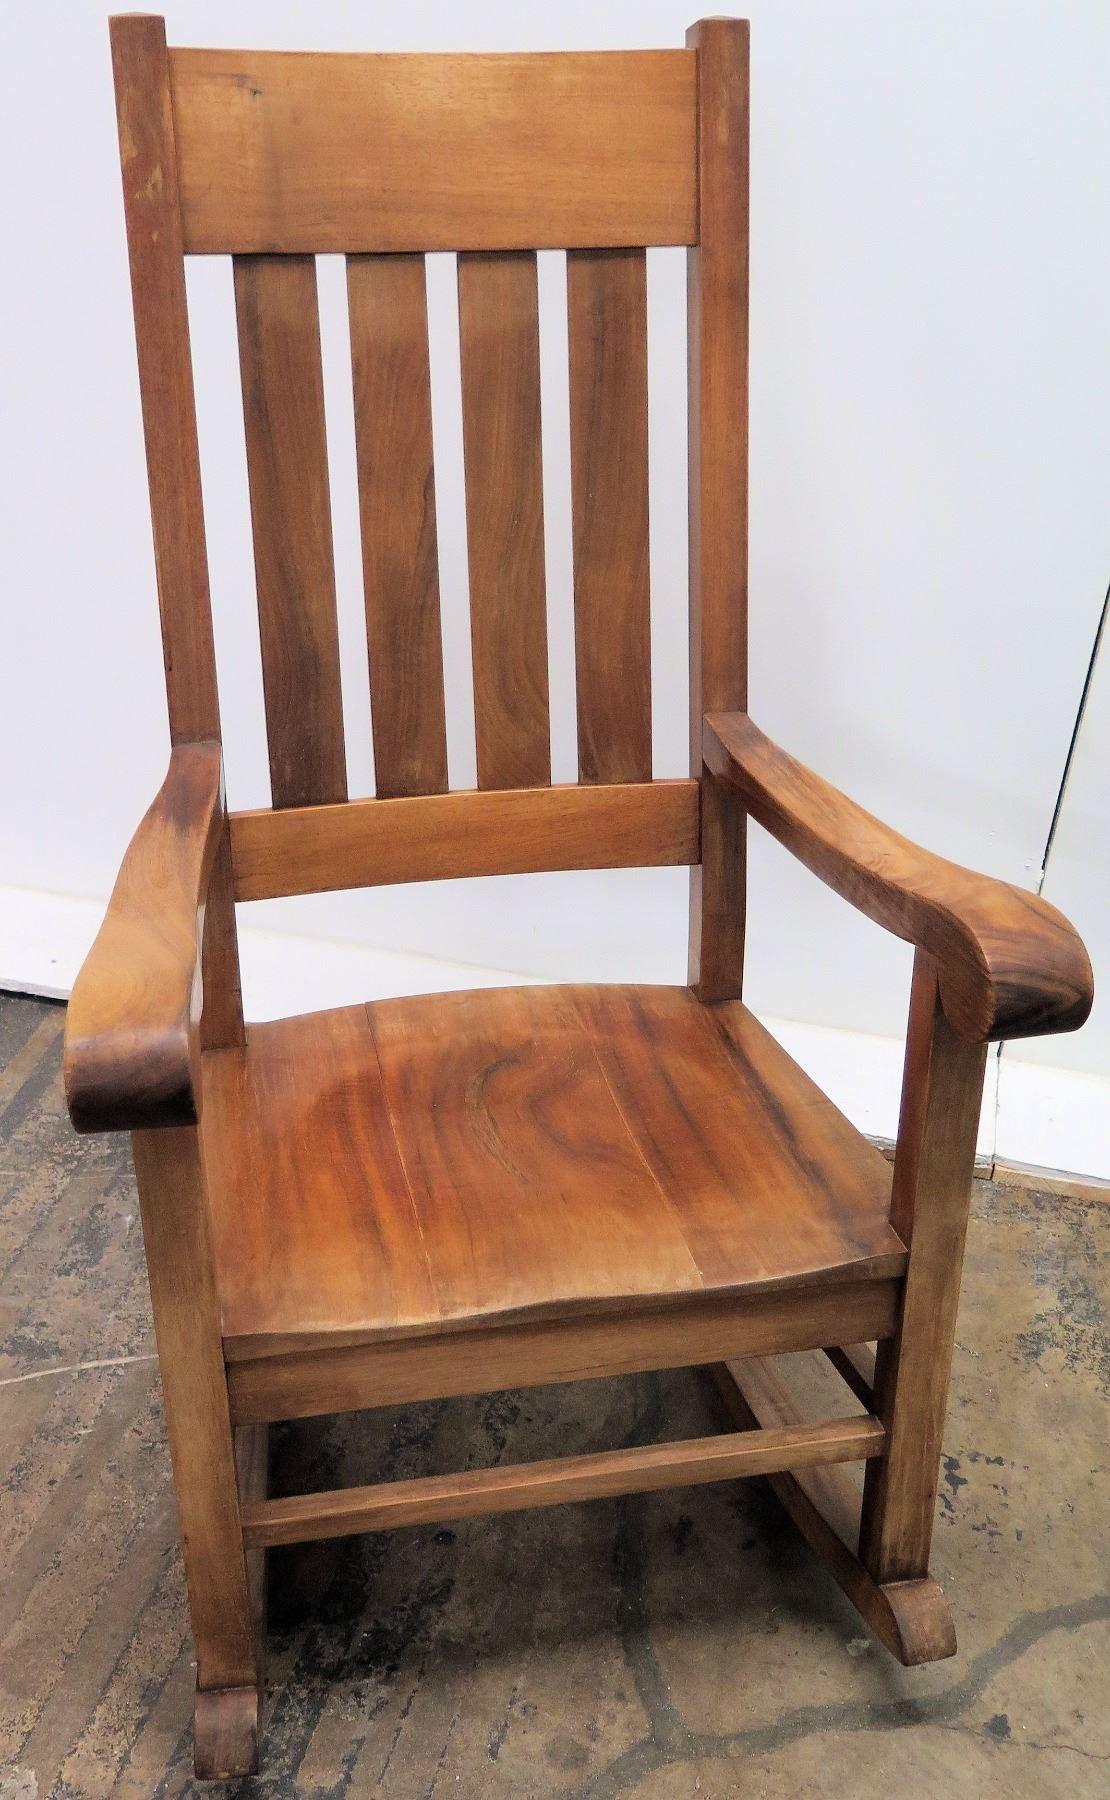 Pleasant Koa Wood Rocking Chair W Scroll Armrests By Martin Machost Co Dining Chair Design Ideas Machostcouk